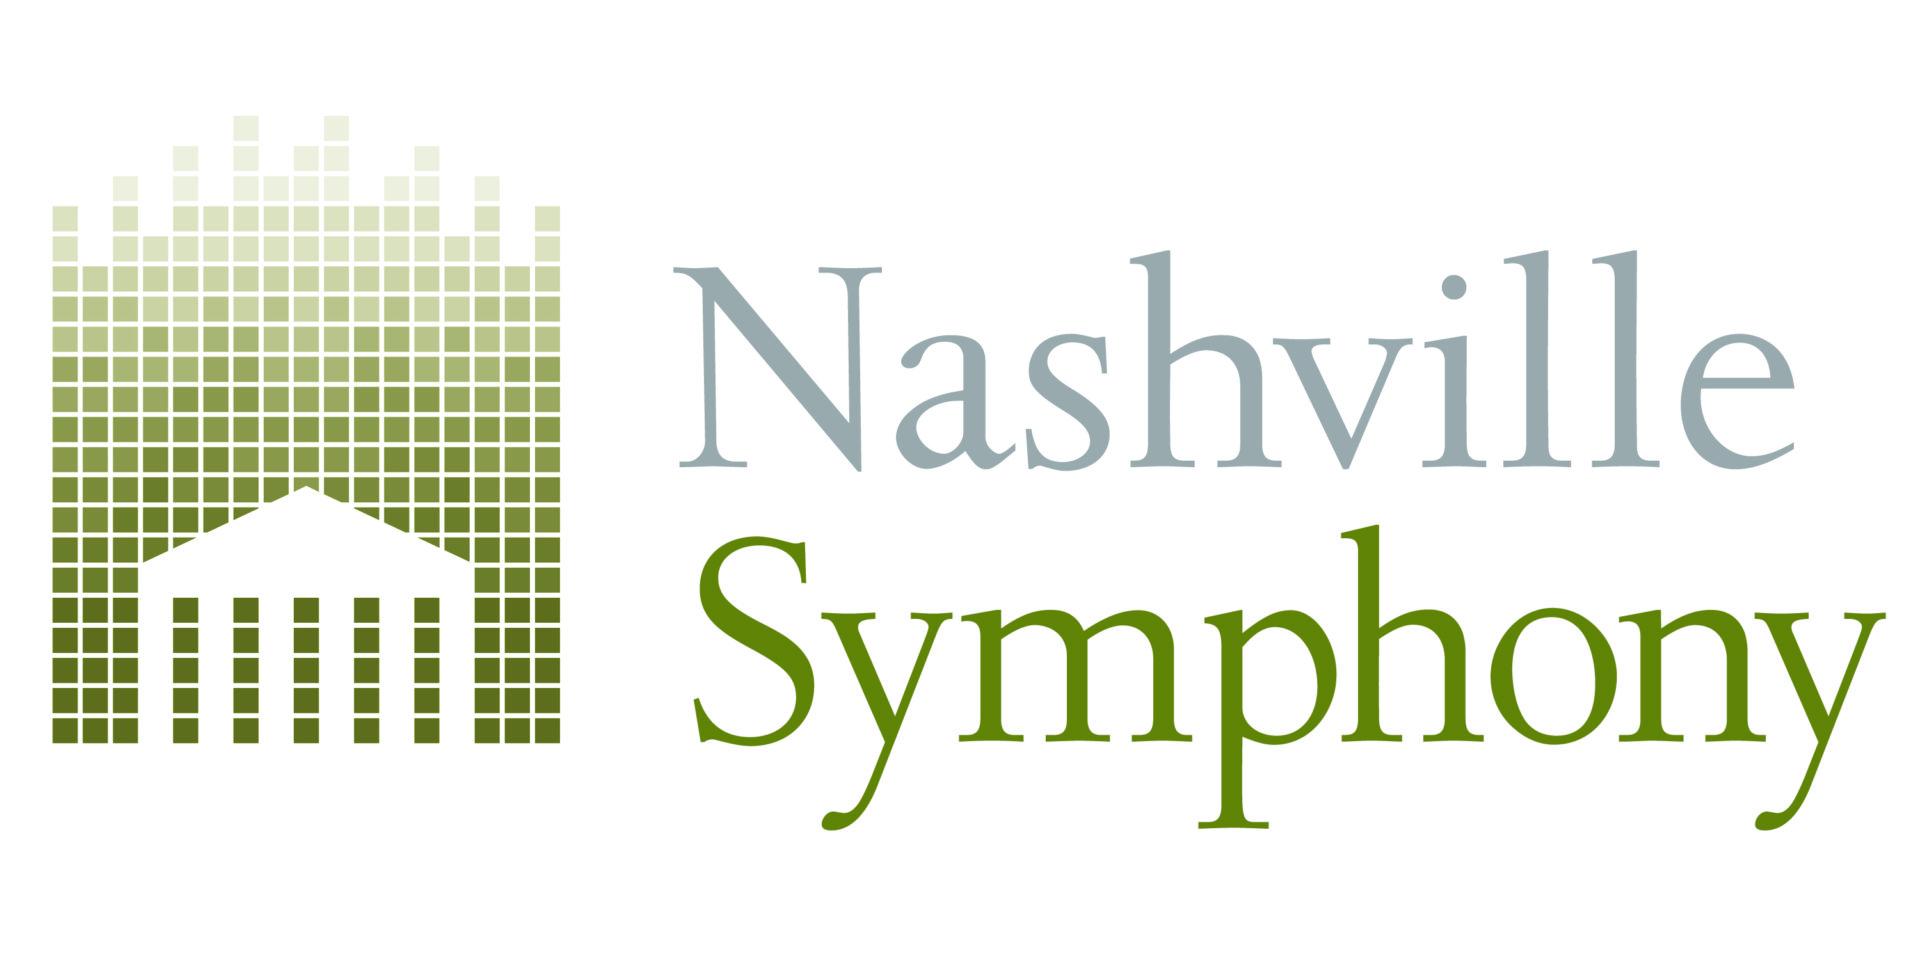 Nashville Symphony offers Concerts, Music, Events, C